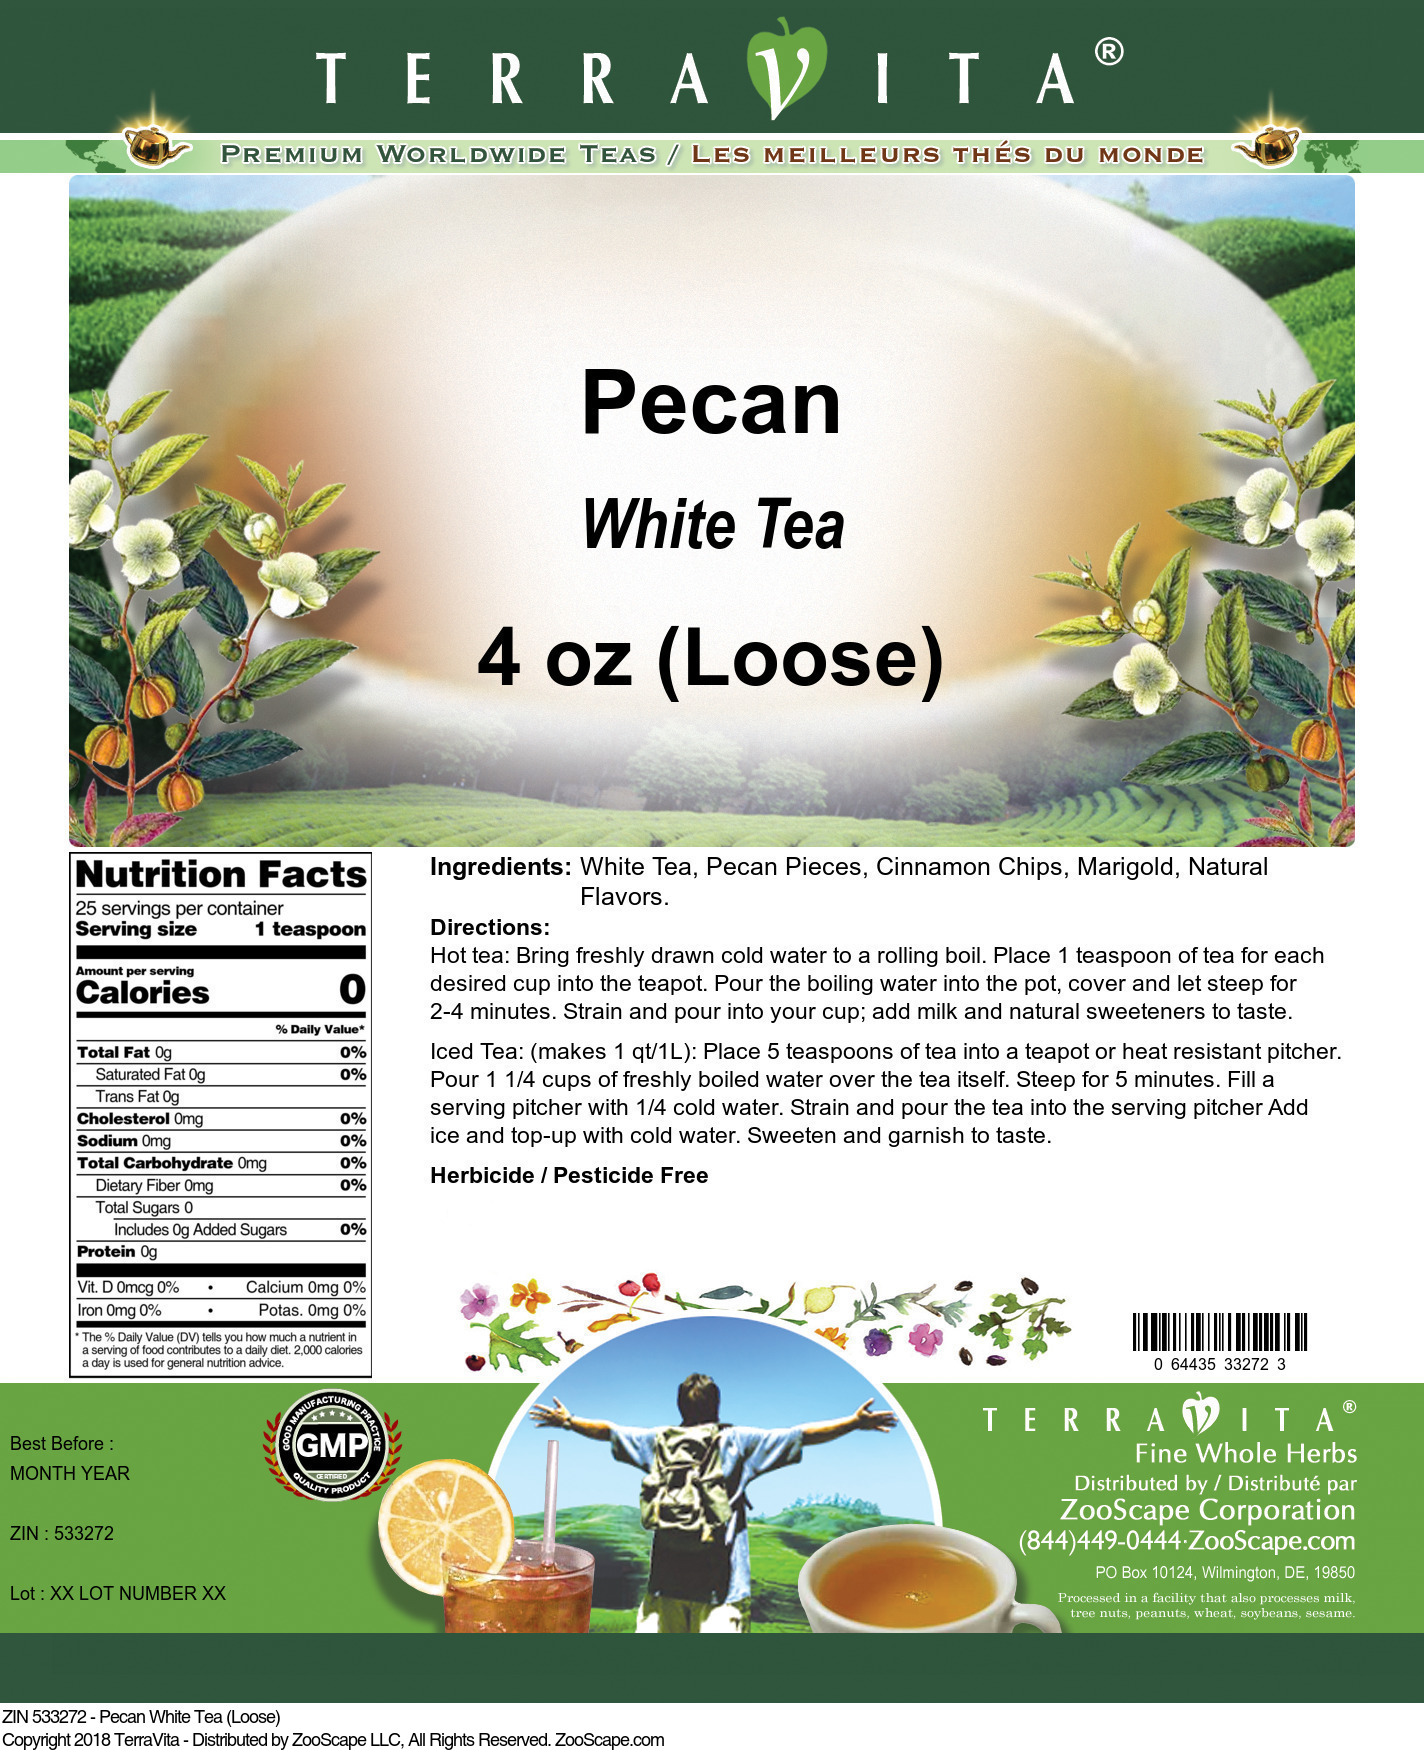 Pecan White Tea (Loose)